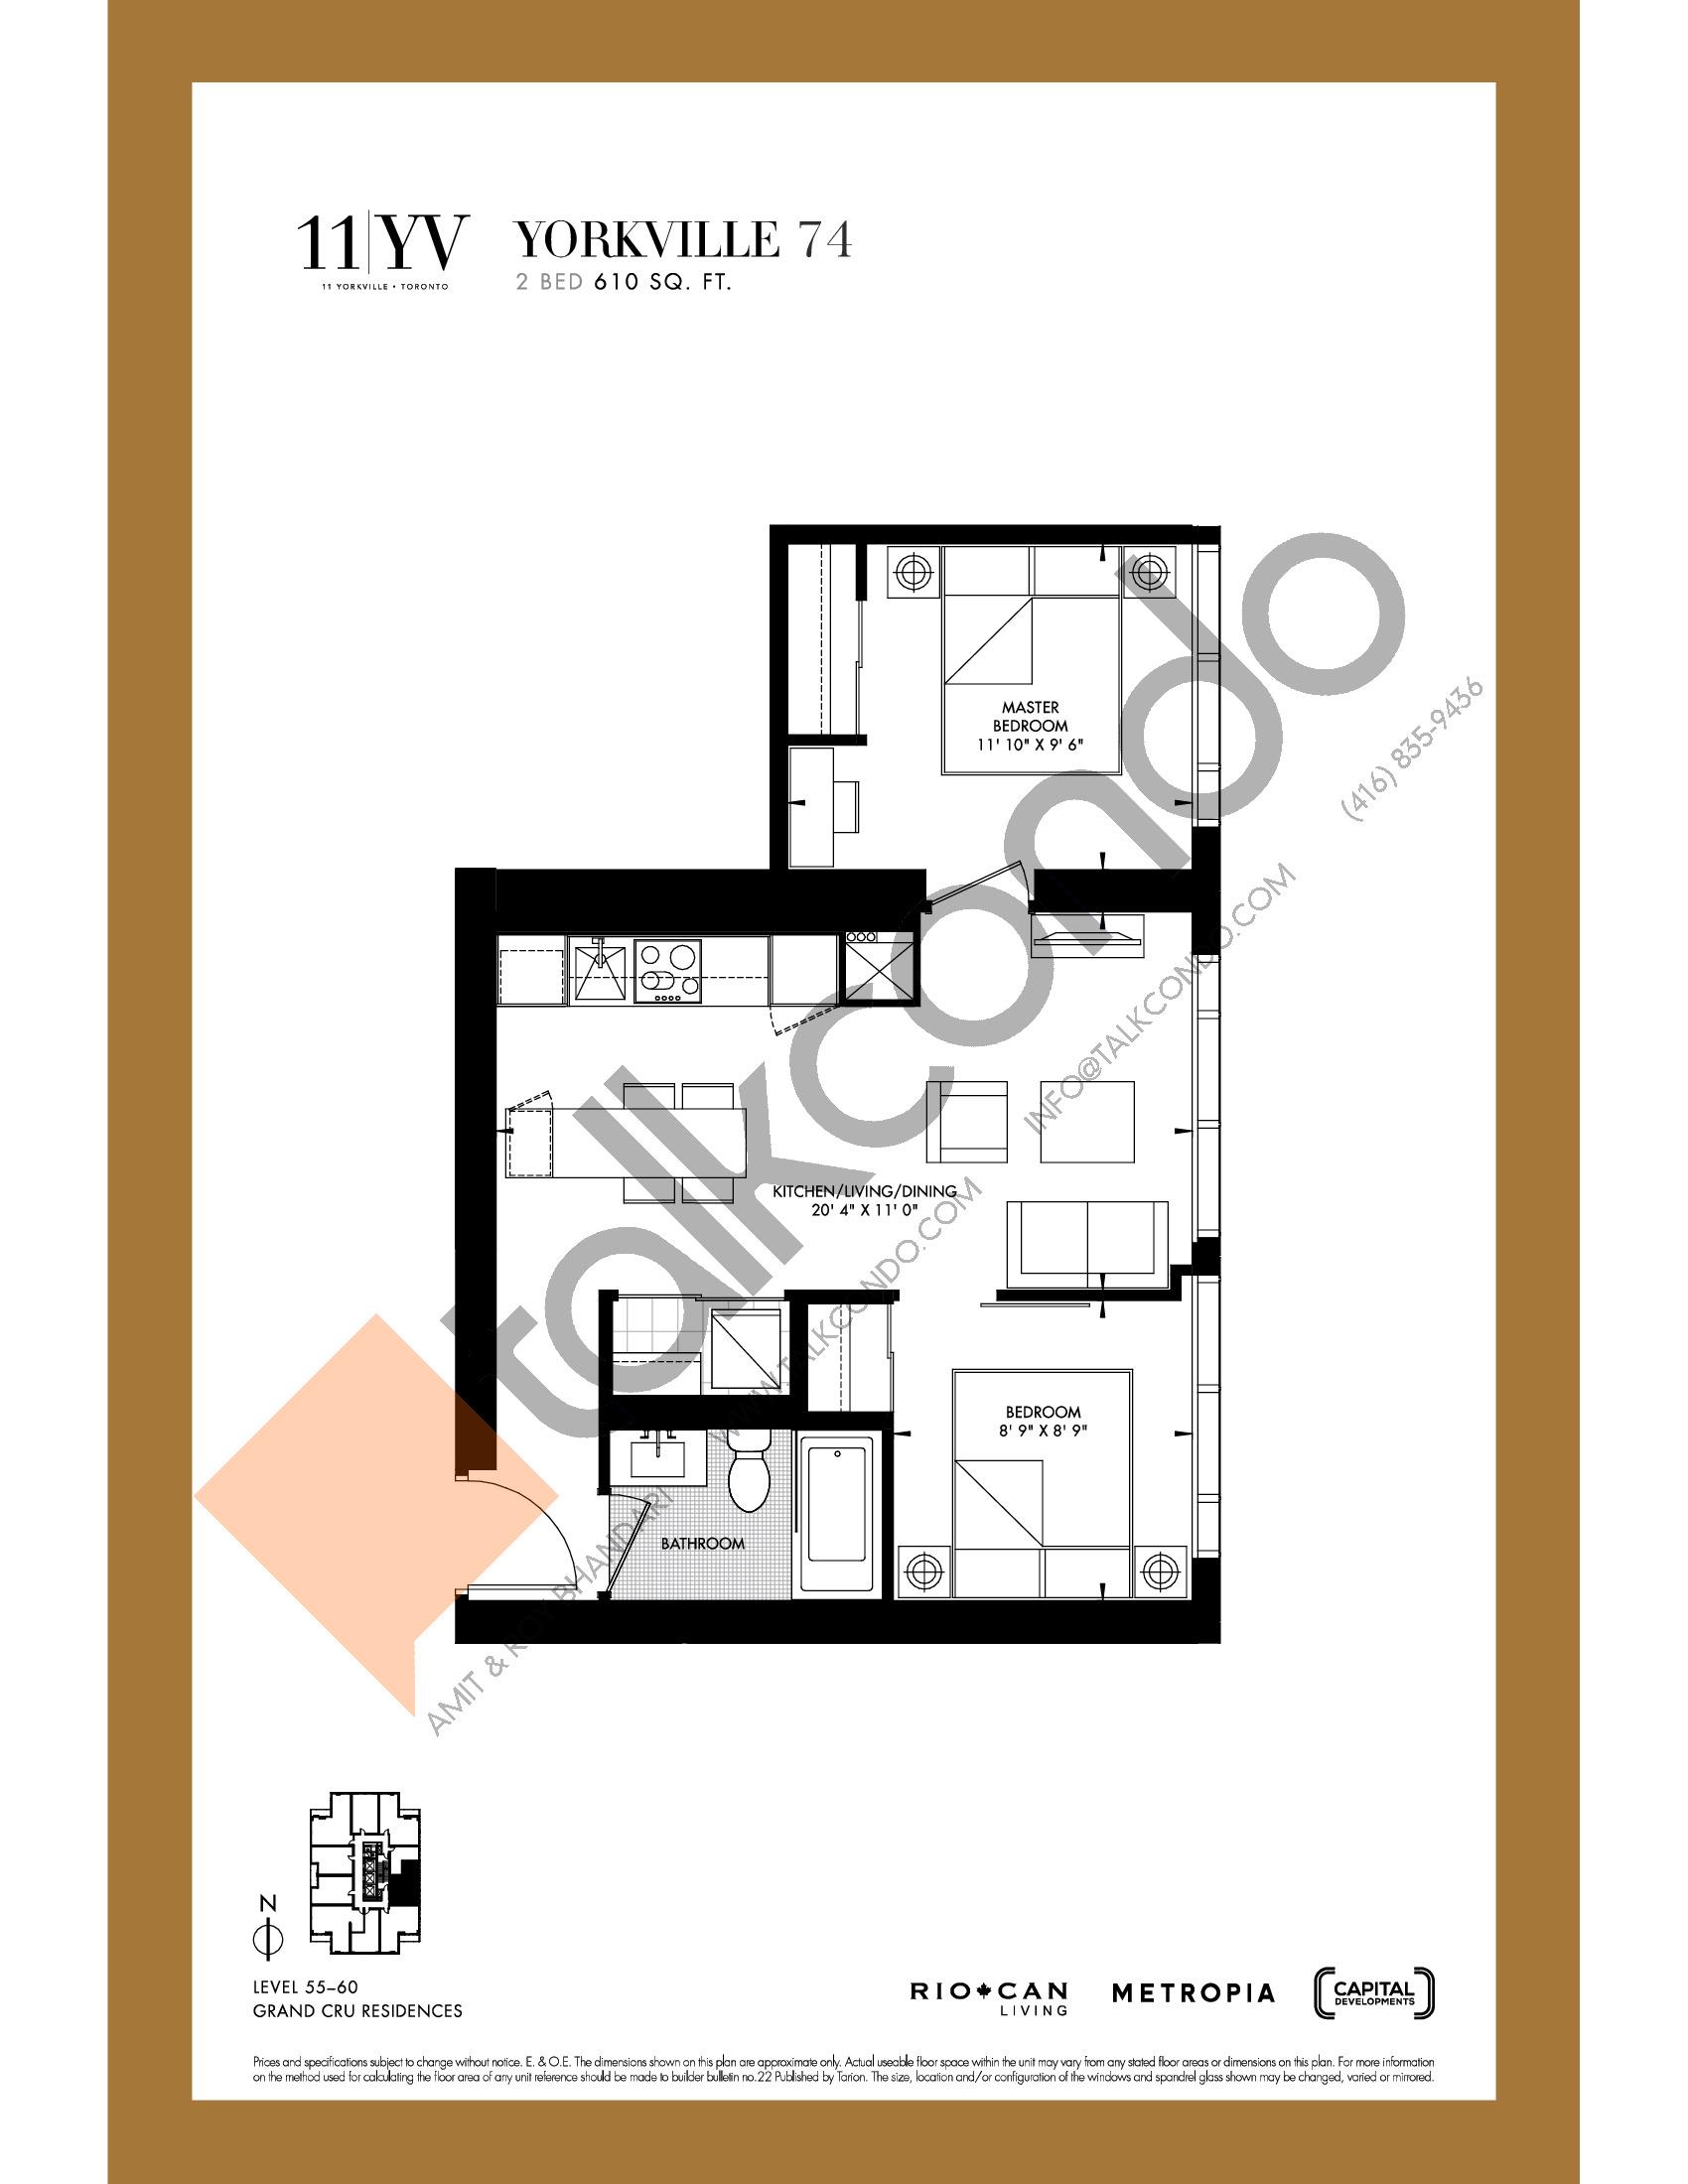 Yorkville 74 Floor Plan at 11YV Condos - 610 sq.ft